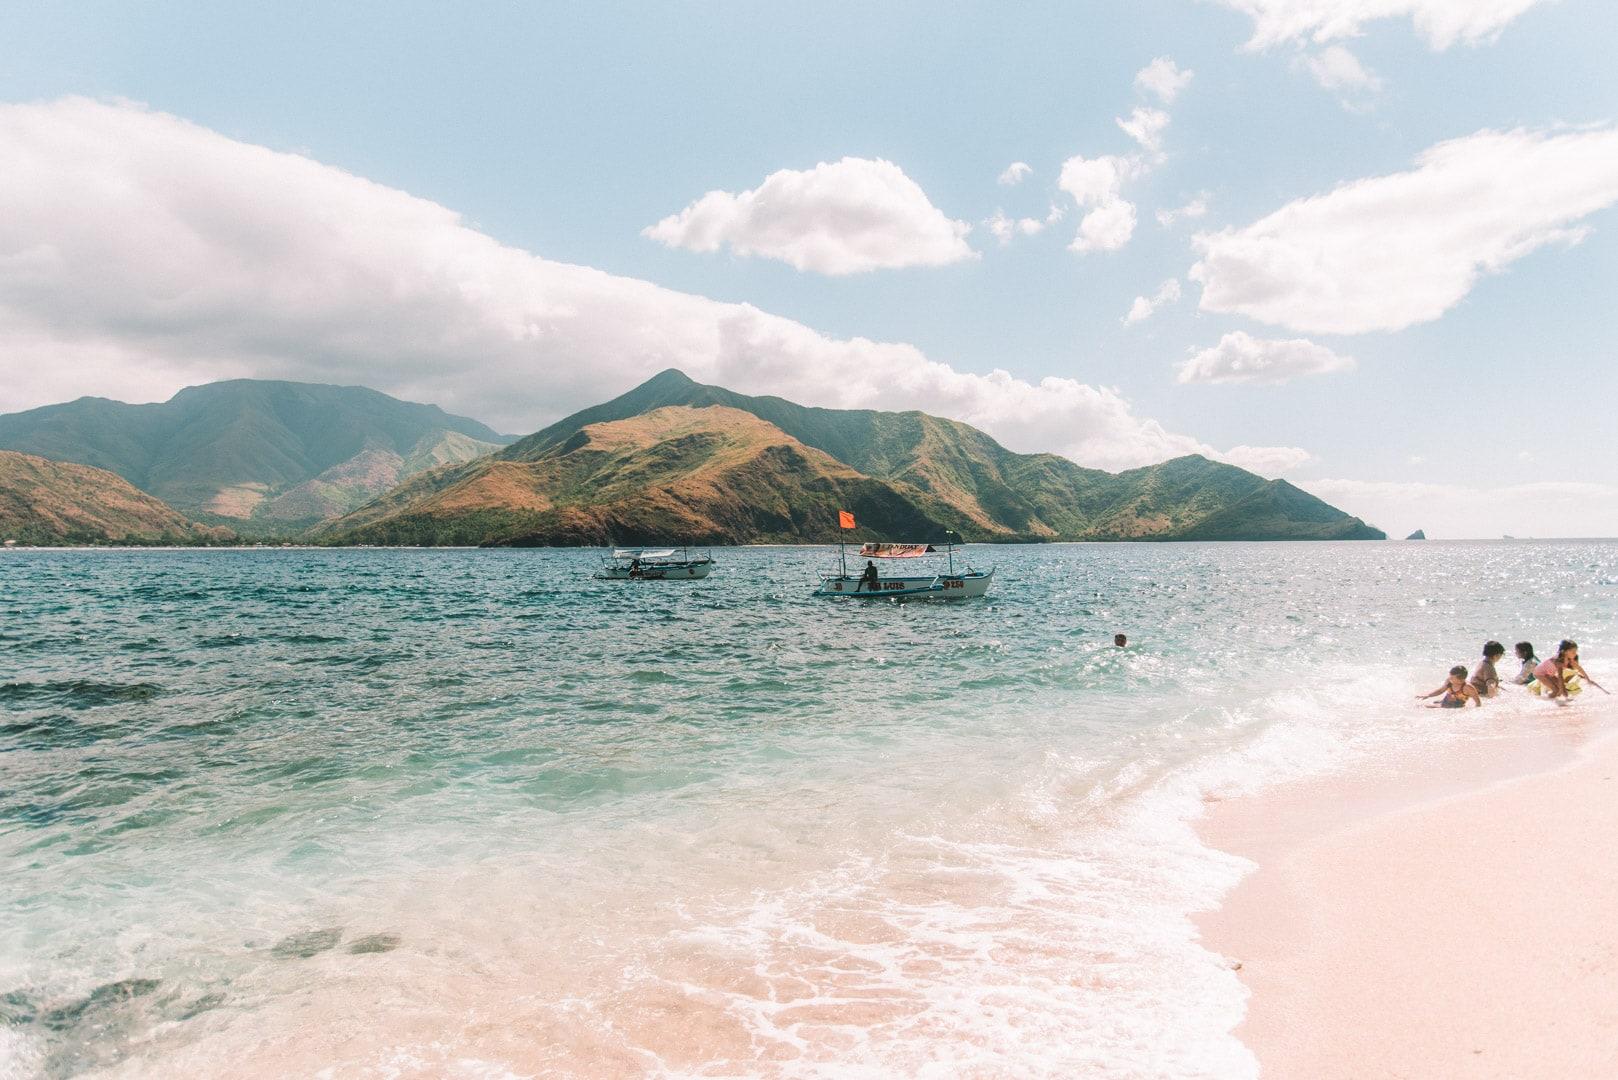 nearest beach in pampanga, beaches near Pampanga